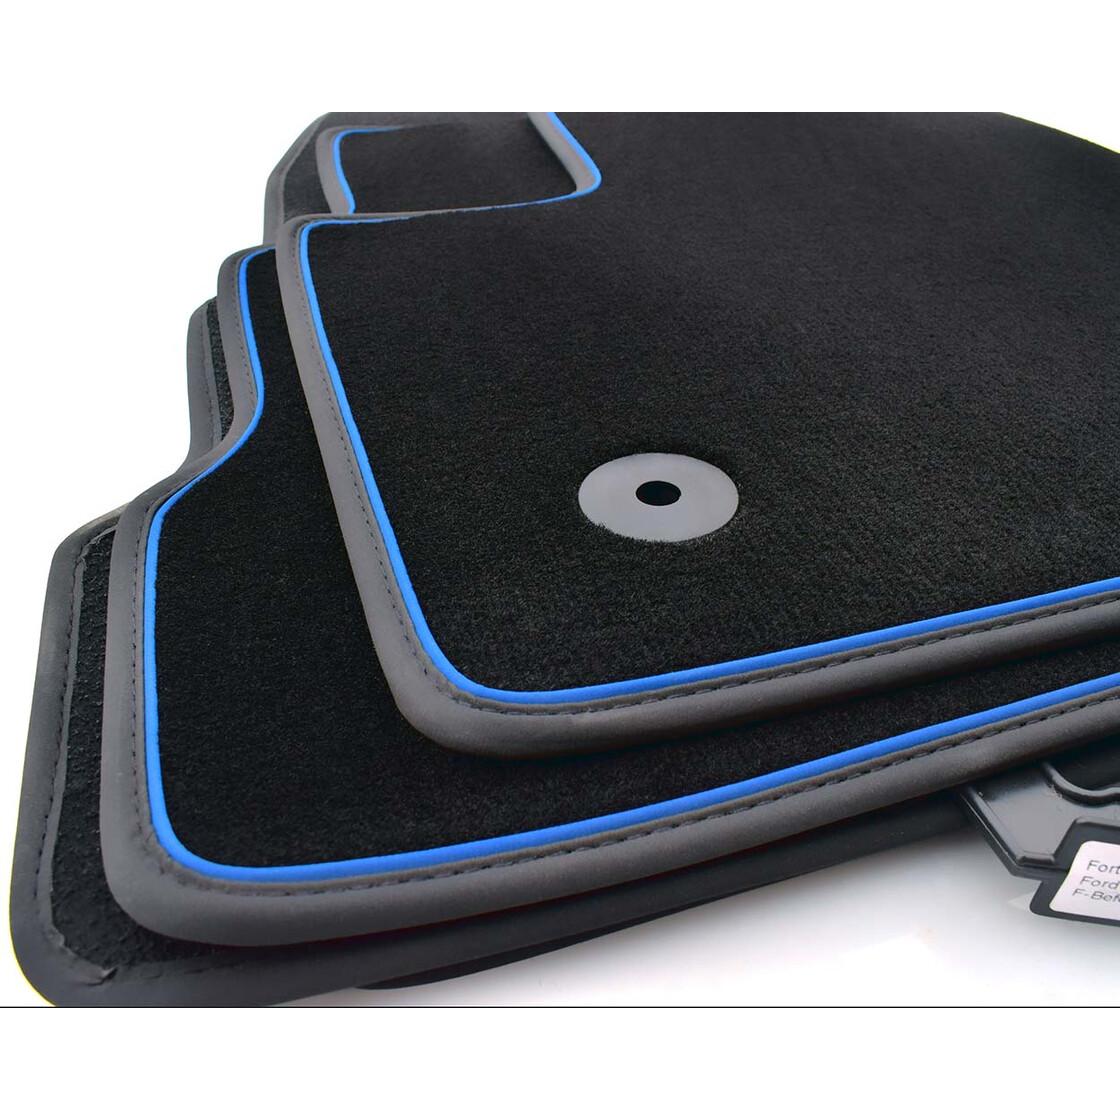 ford kuga ii 2017 fu matten autoteppich zierband blau. Black Bedroom Furniture Sets. Home Design Ideas